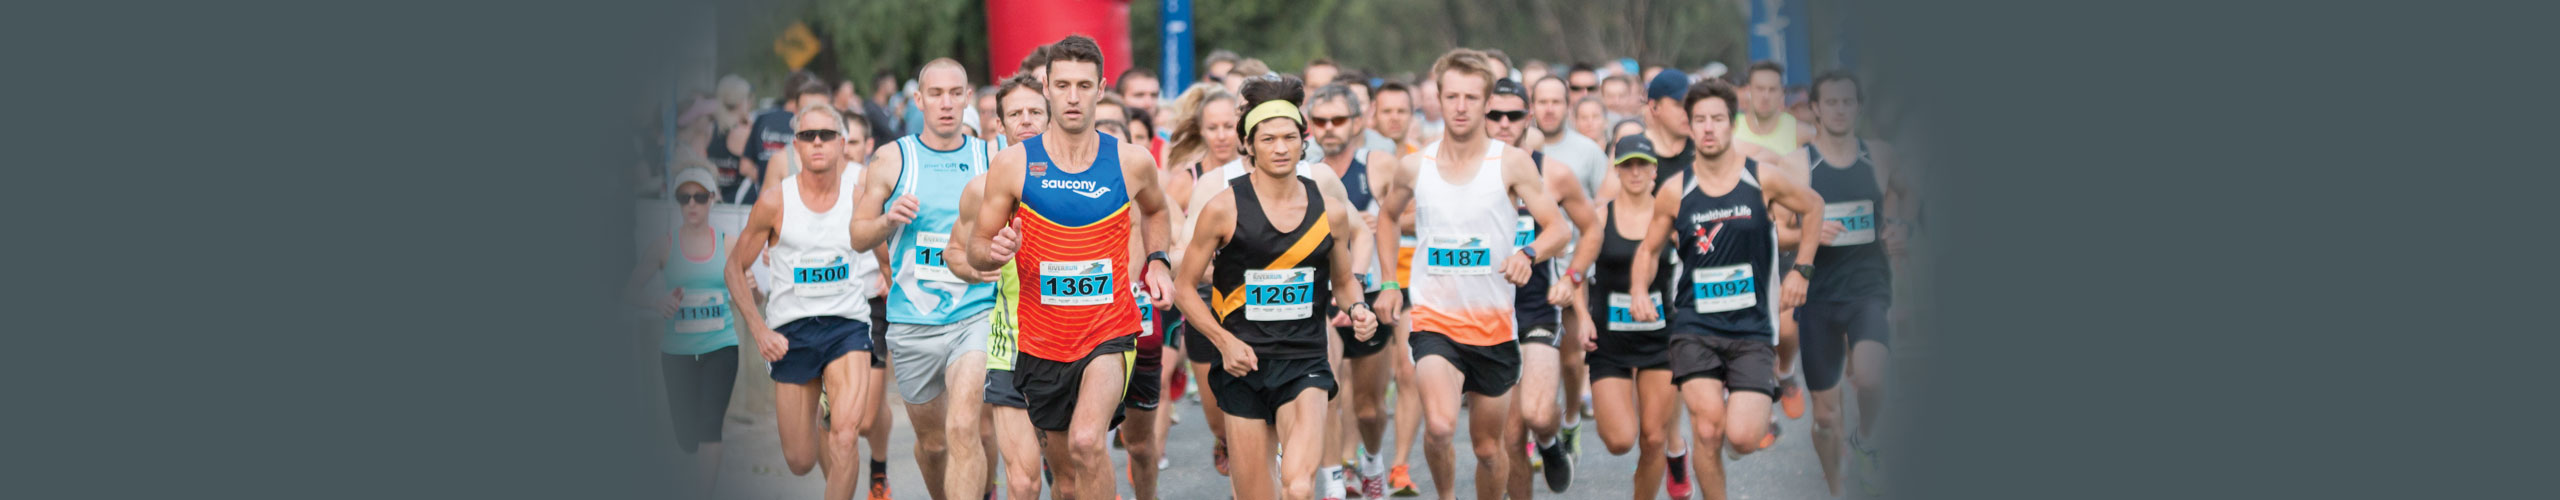 River Run, Geelong, Chiropractic, Myotherapy, Podiatry